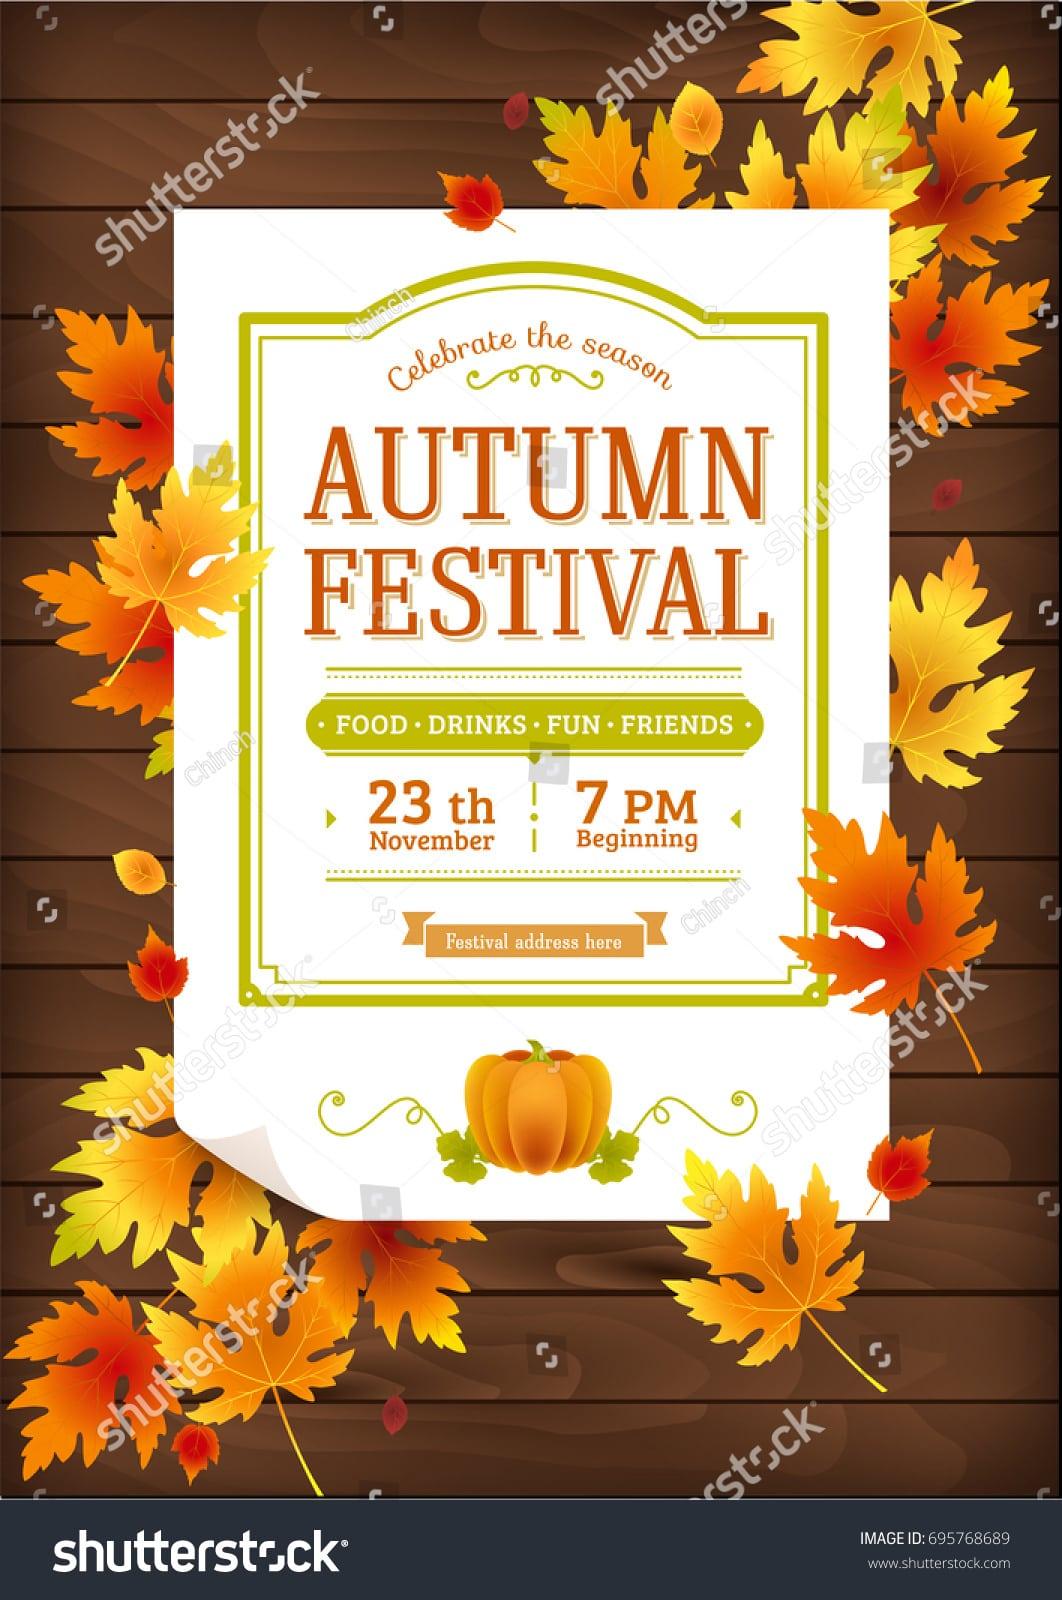 Autumn Festival Fall Party Invitation Autumn Stock Vector